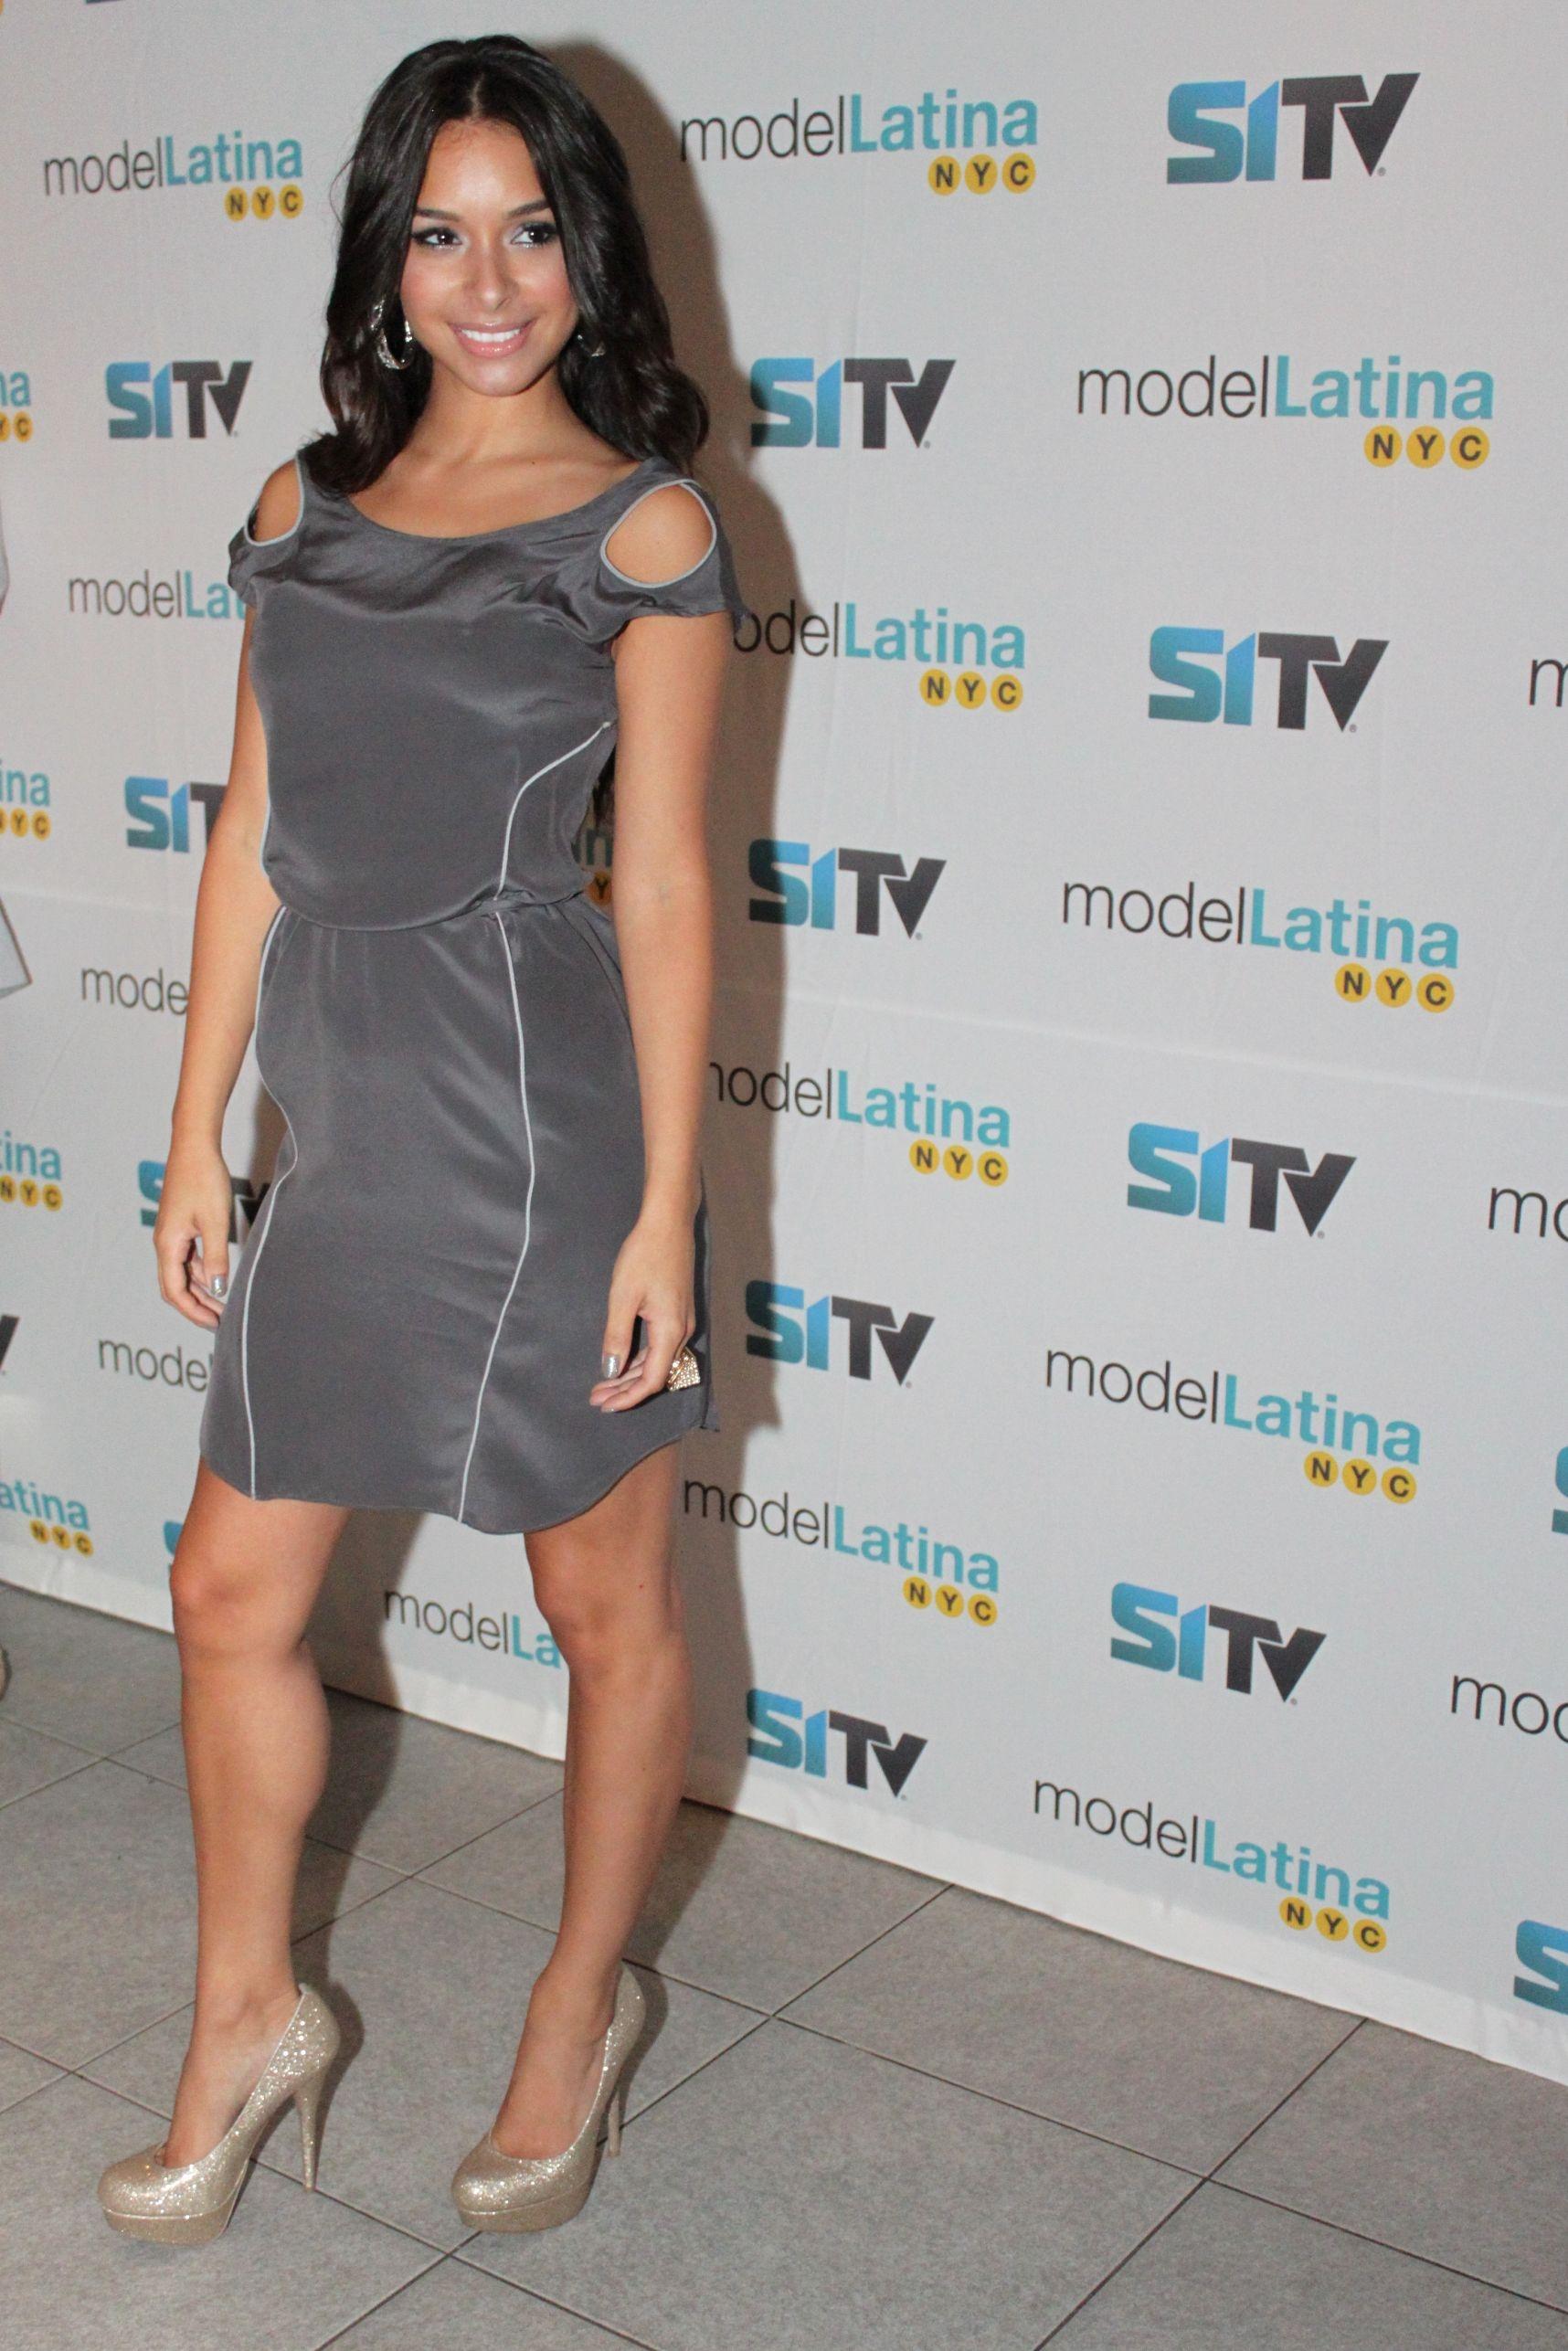 PHOTOS: Model Latina Premiere Party!